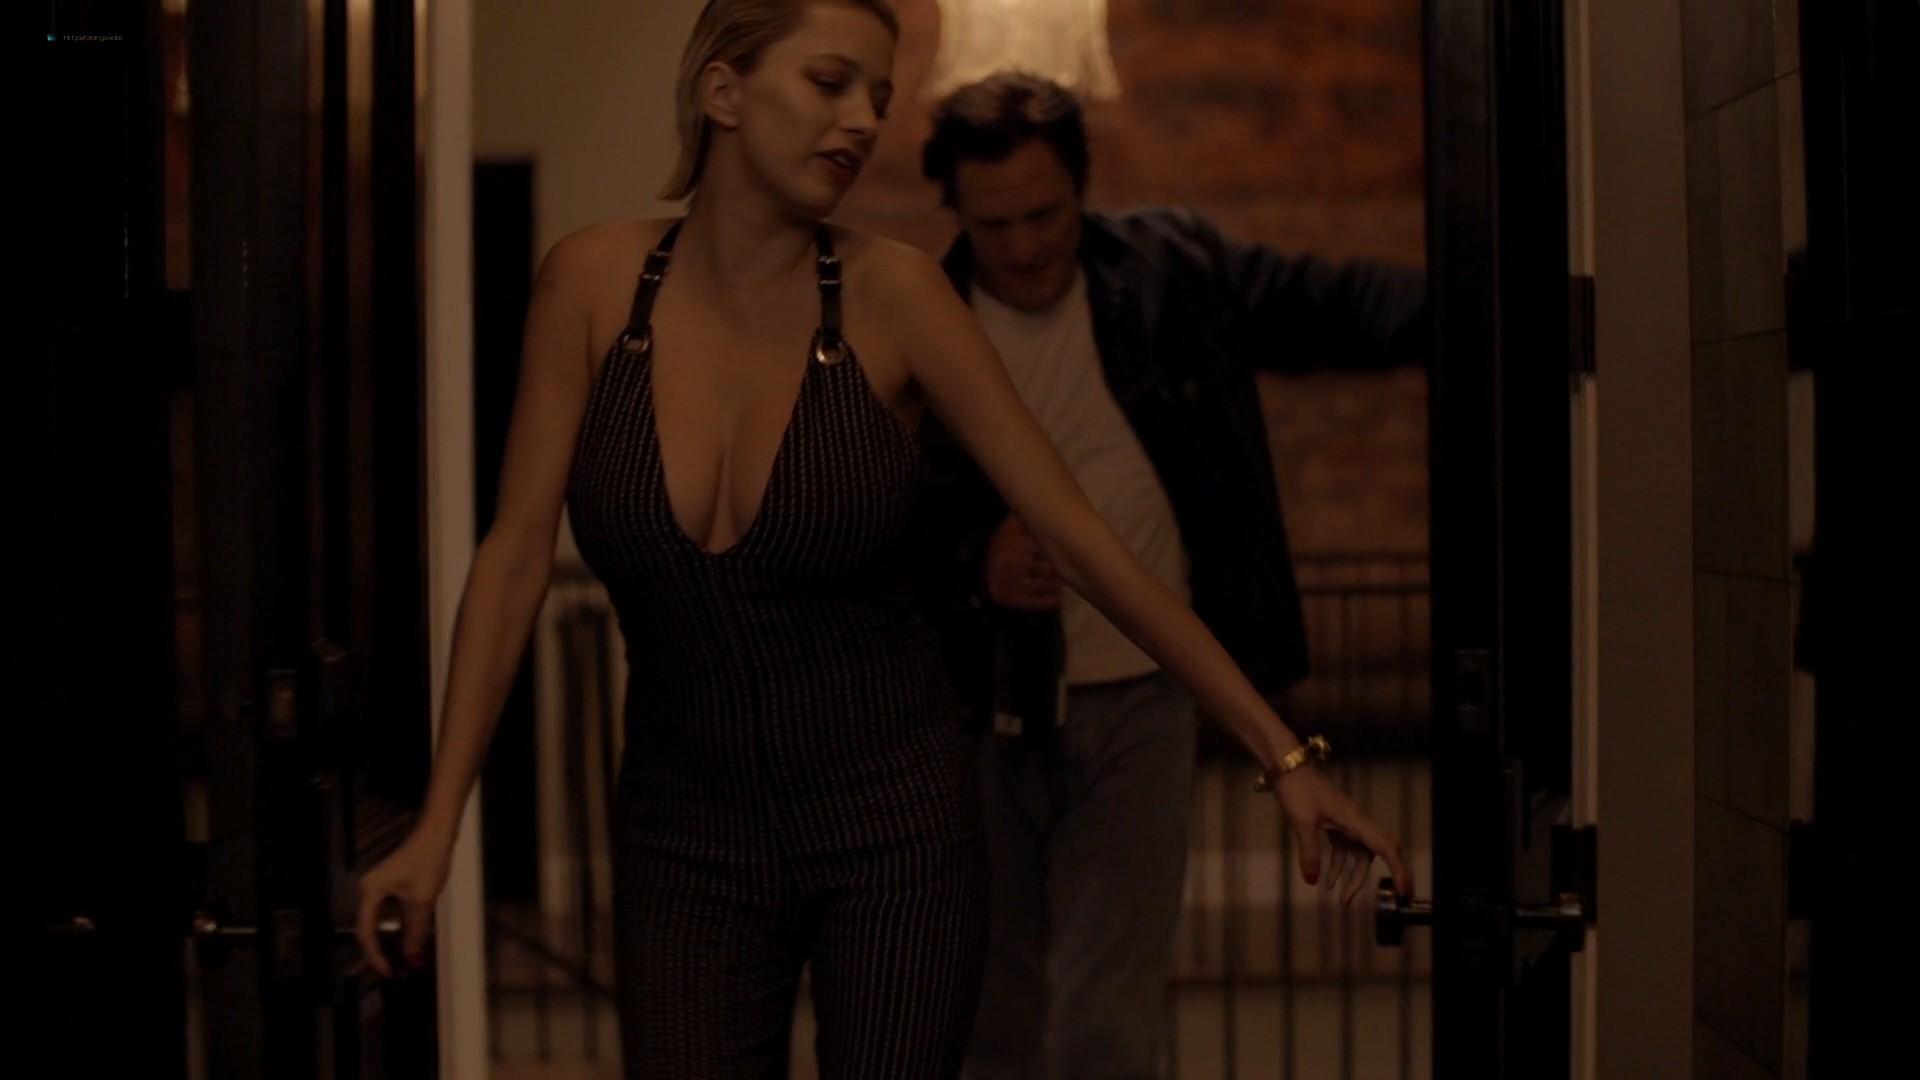 Caroline Vreeland busty see through Zoe Chait, Kenzie Dalton hot - Red Handed (2019) 1080p Web (17)